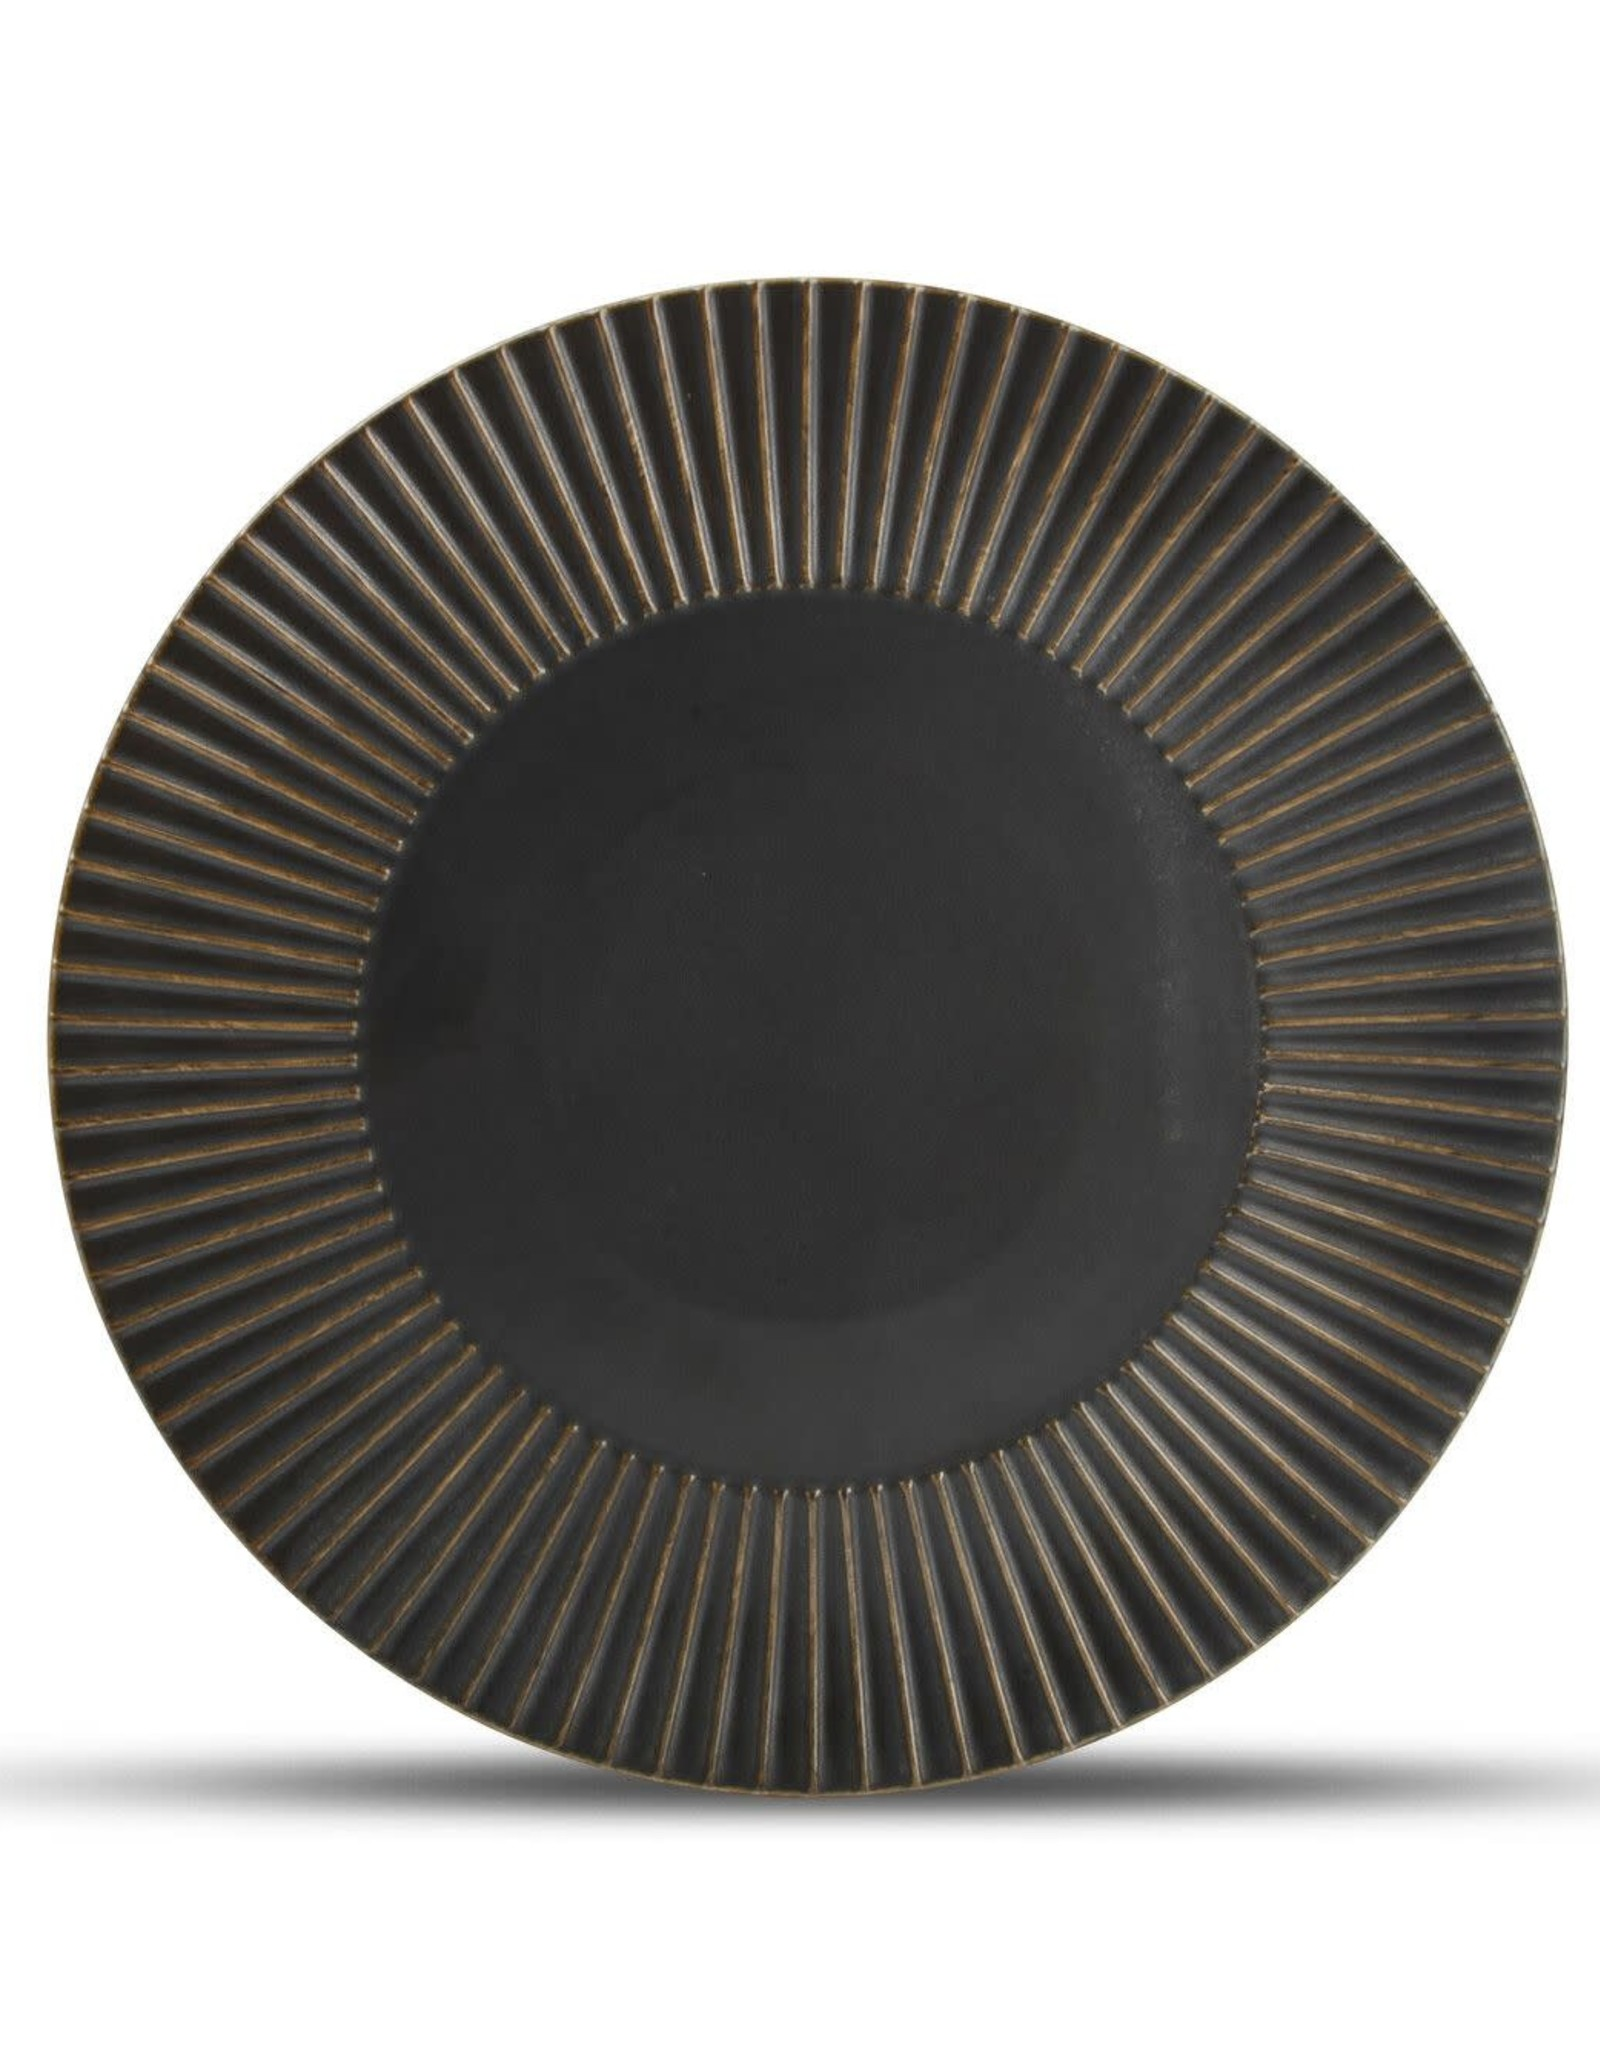 Dinerbord Wabi Sabi Ø27,5 cm